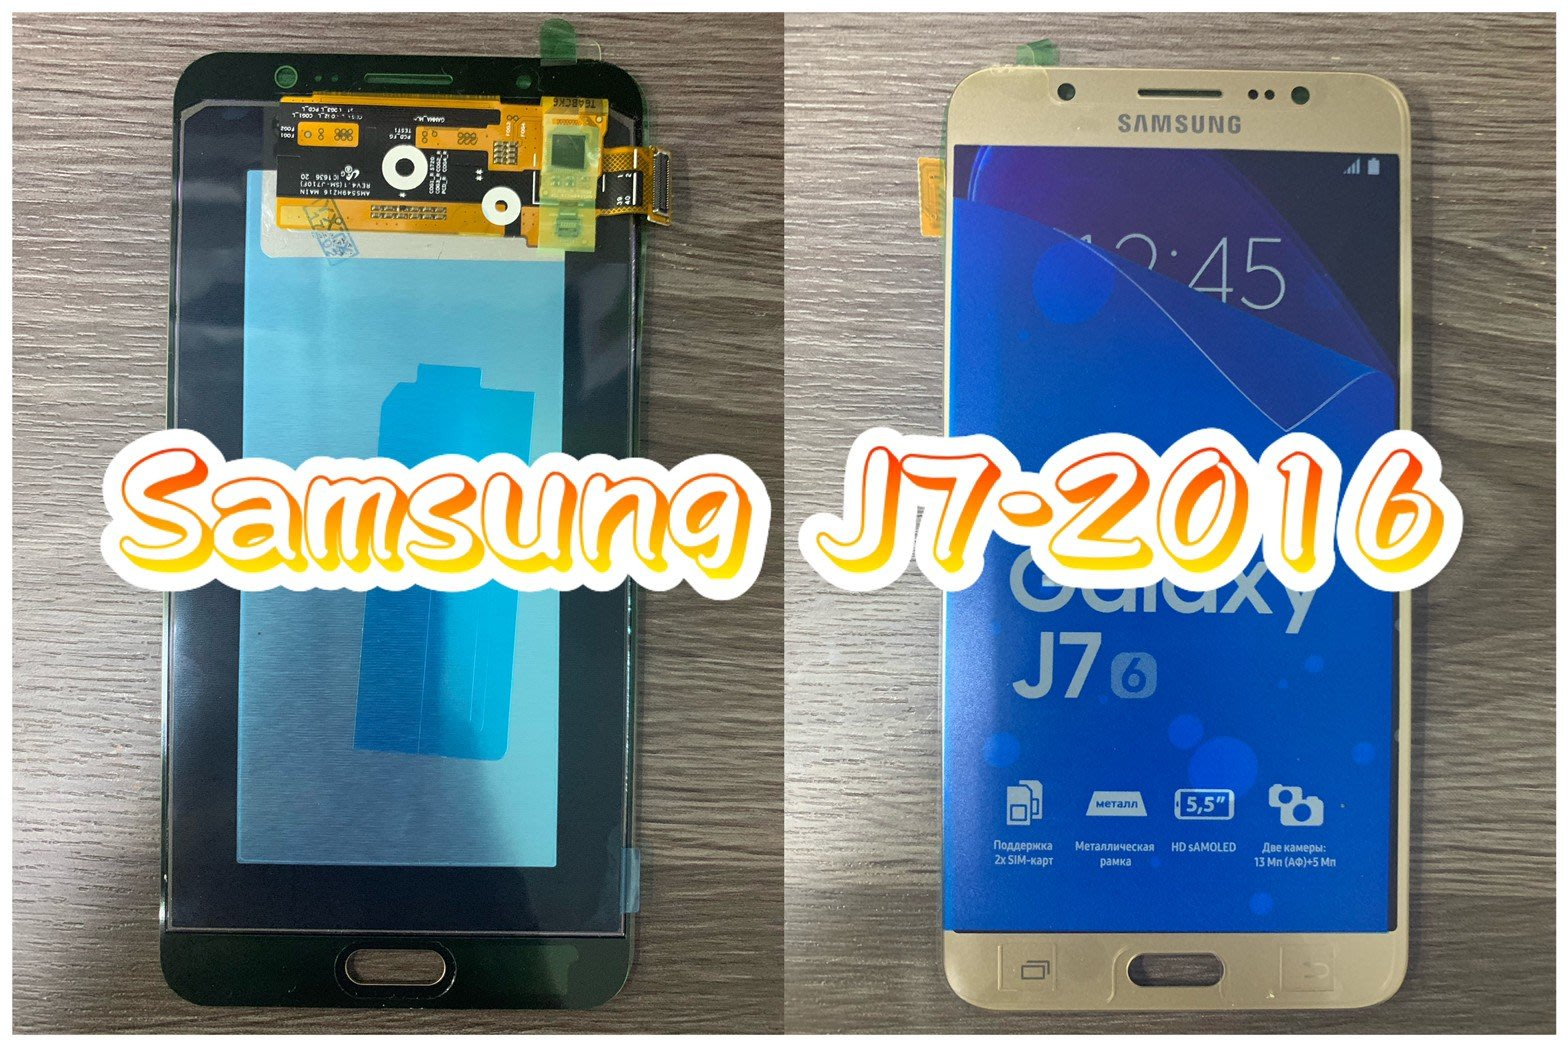 Samsung三星 J7-2016螢幕總成 送拆機工具 ◎另可預約現場維修